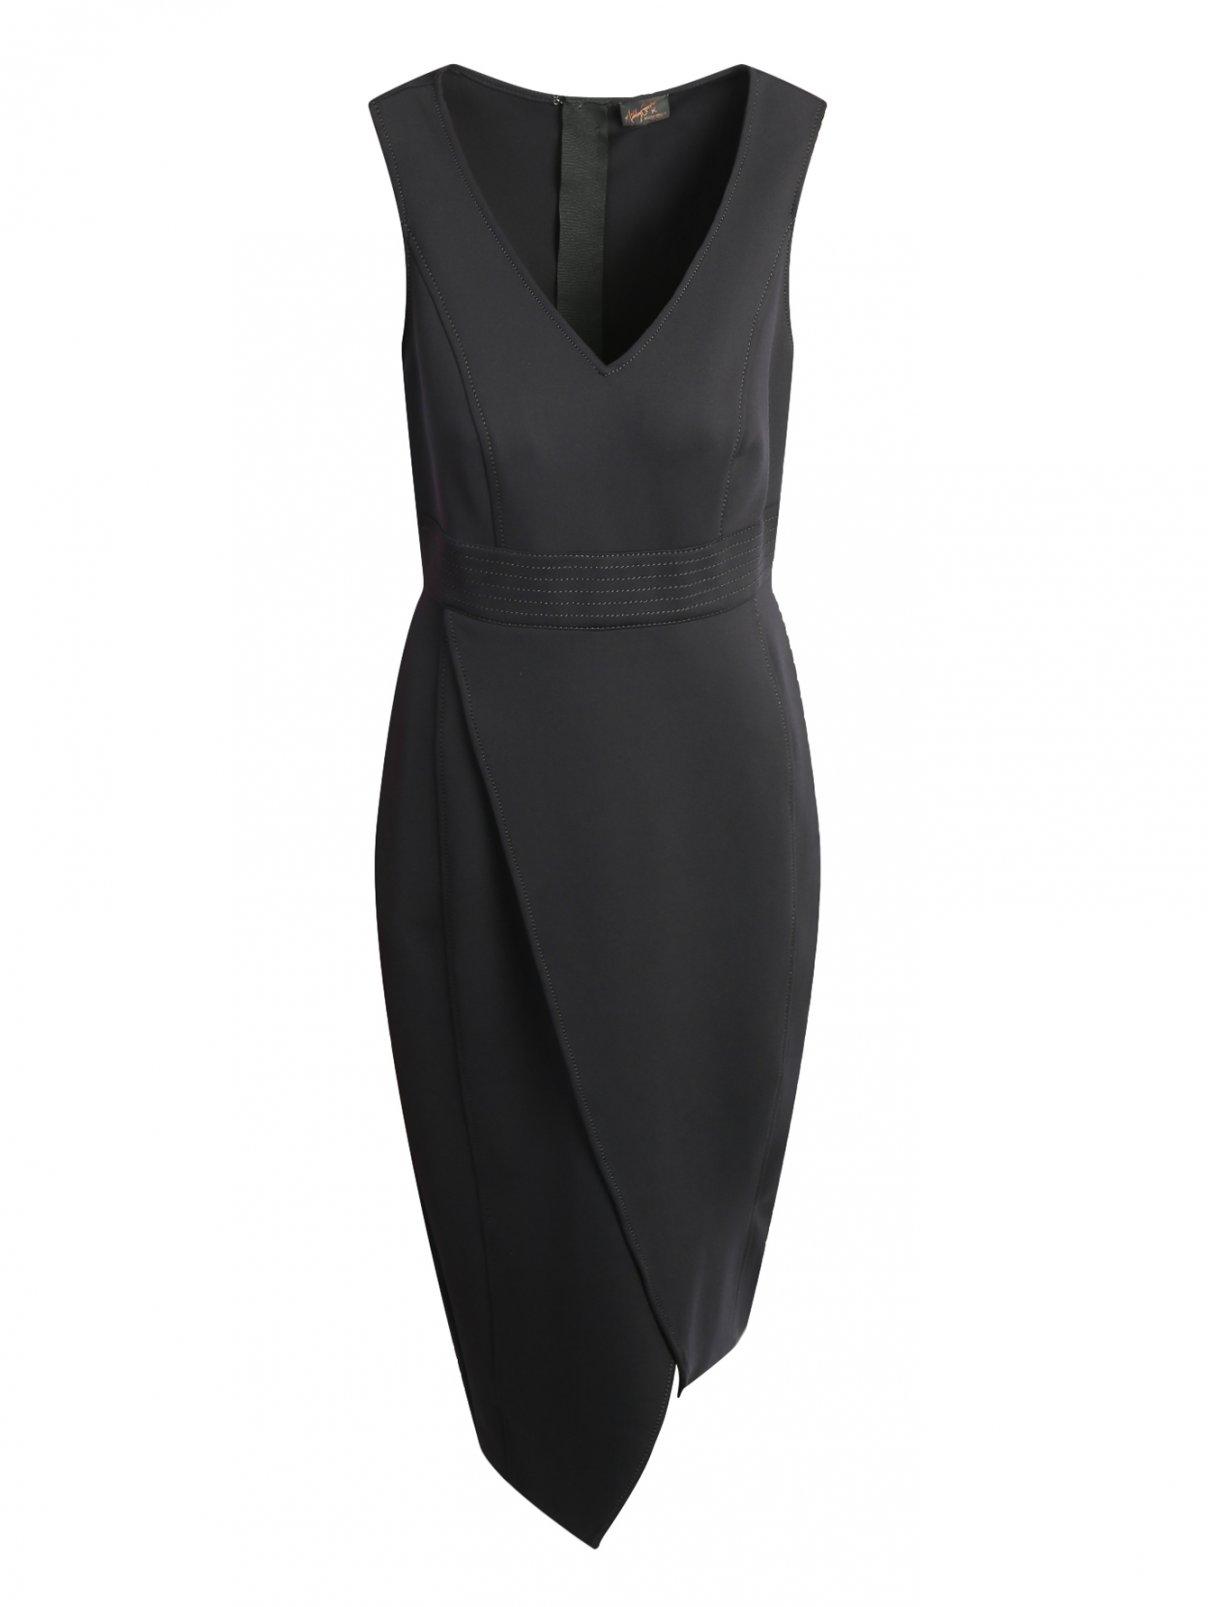 Платье-футляр без рукавов с запахом Marina Rinaldi  –  Общий вид